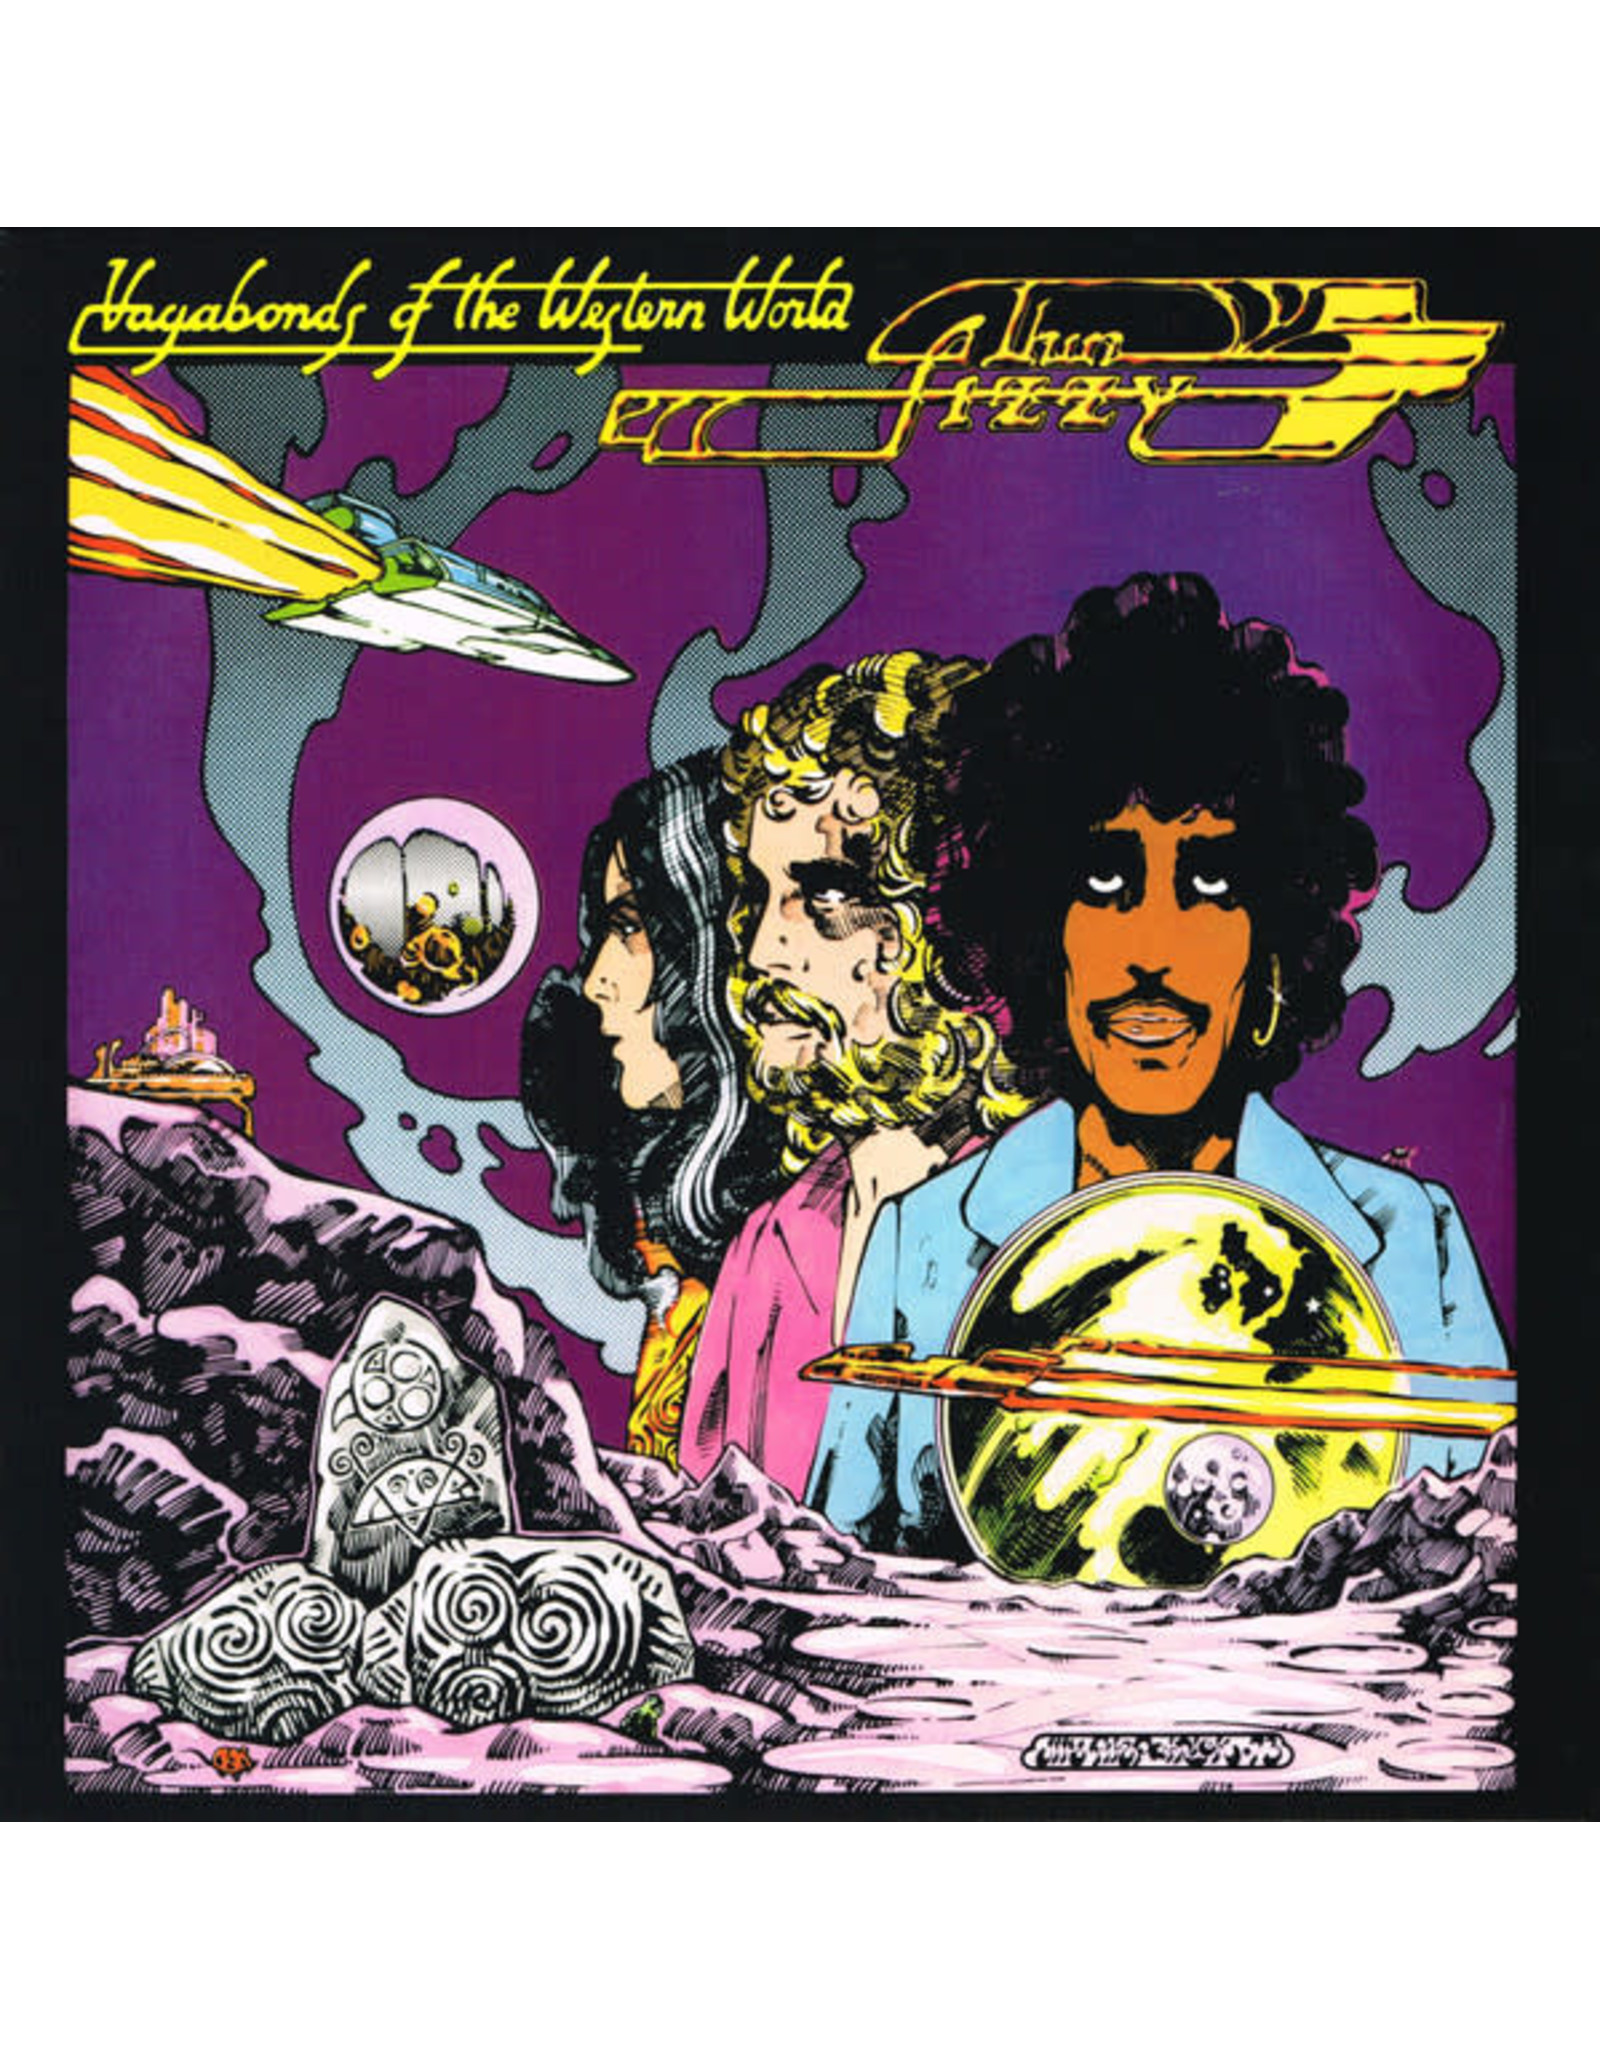 Thin Lizzy - Vagabonds of the Western World LP